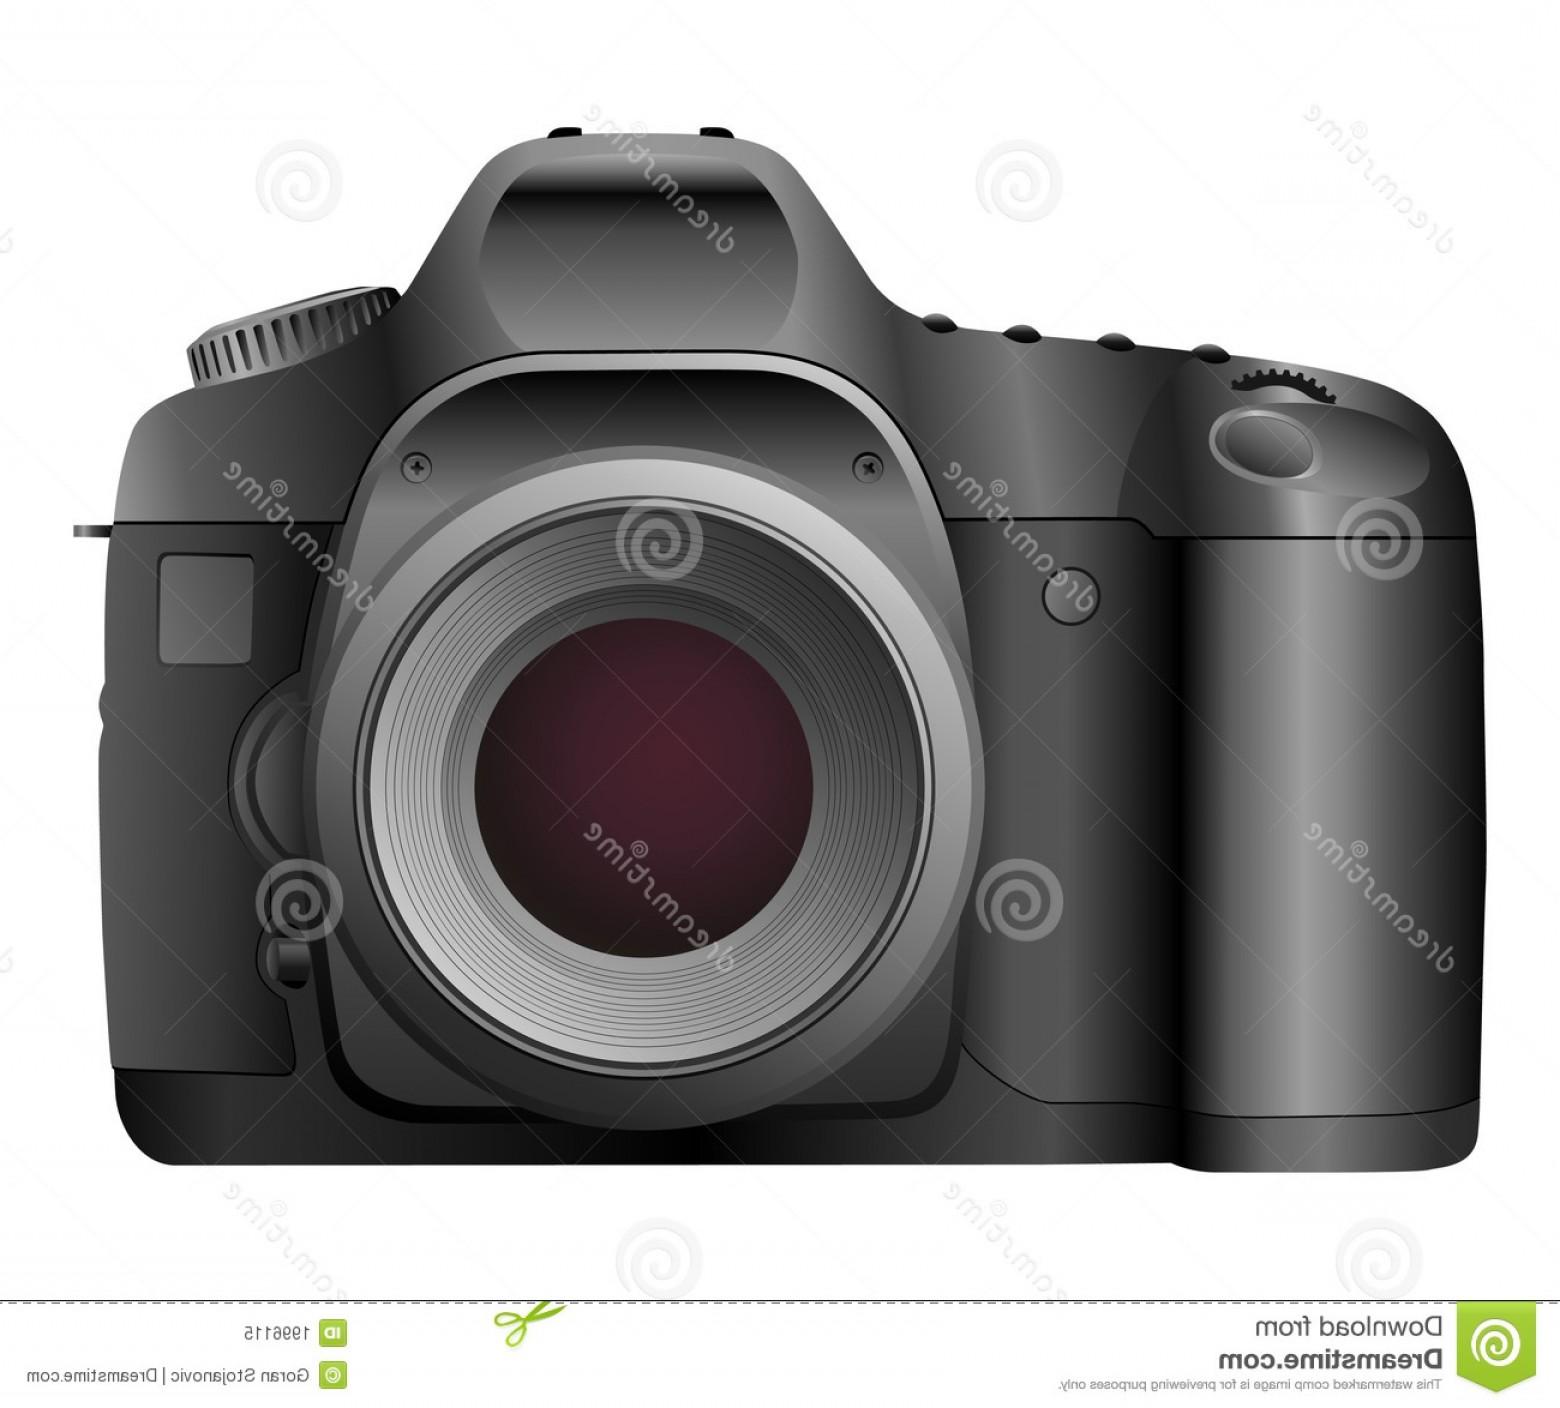 1560x1408 Royalty Free Stock Photo Vector Digital Camera Image Geekchicpro